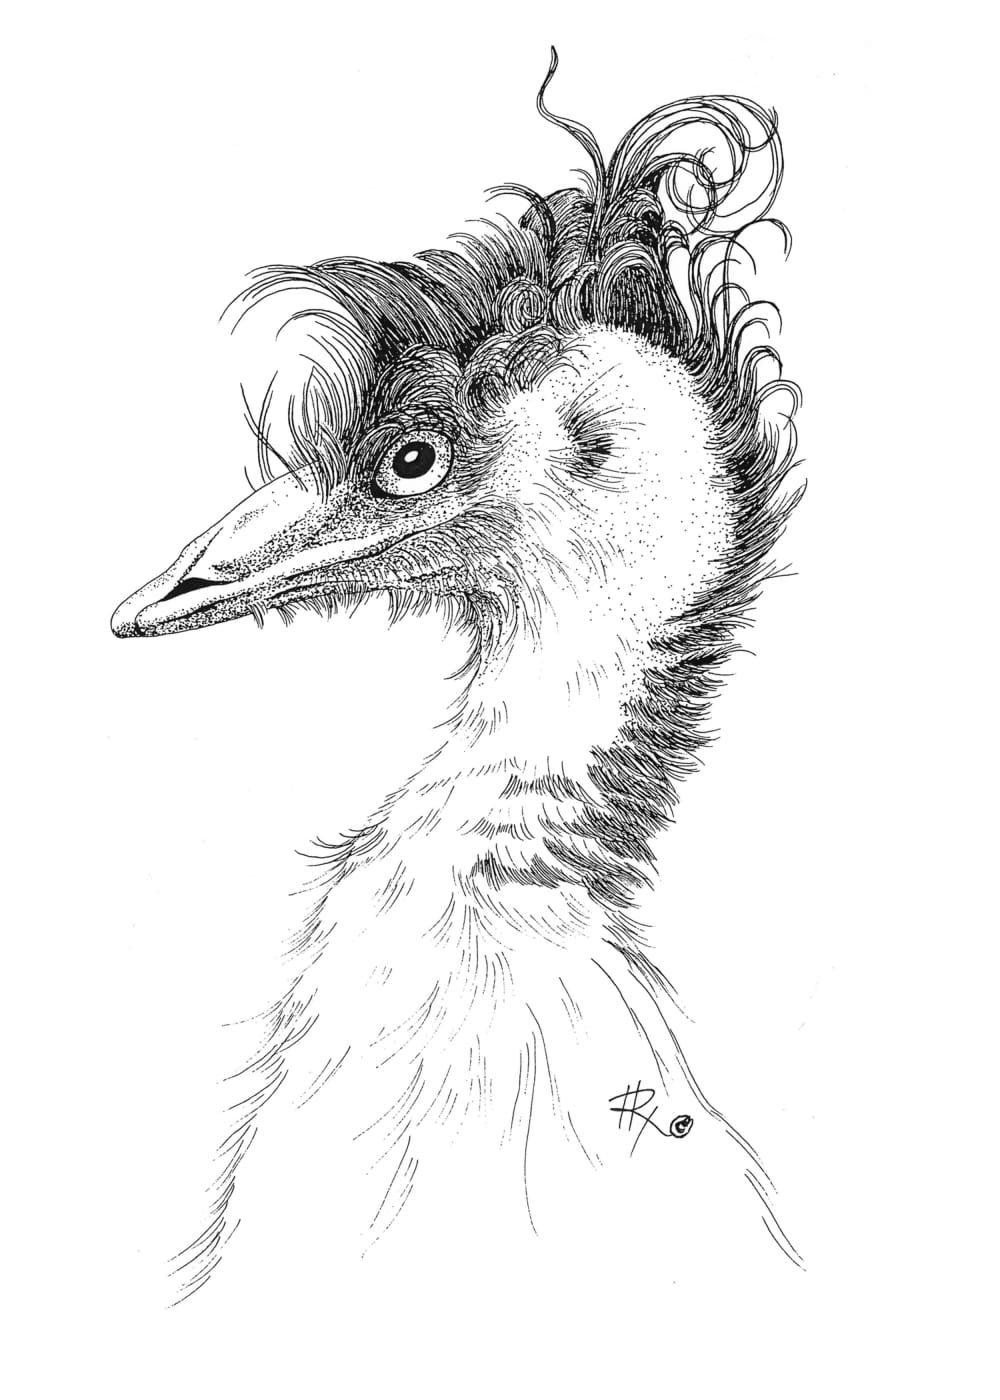 Wild Emu, Framed Matted Wildlife Art Print, Pen and Ink, Bird Art Drawing